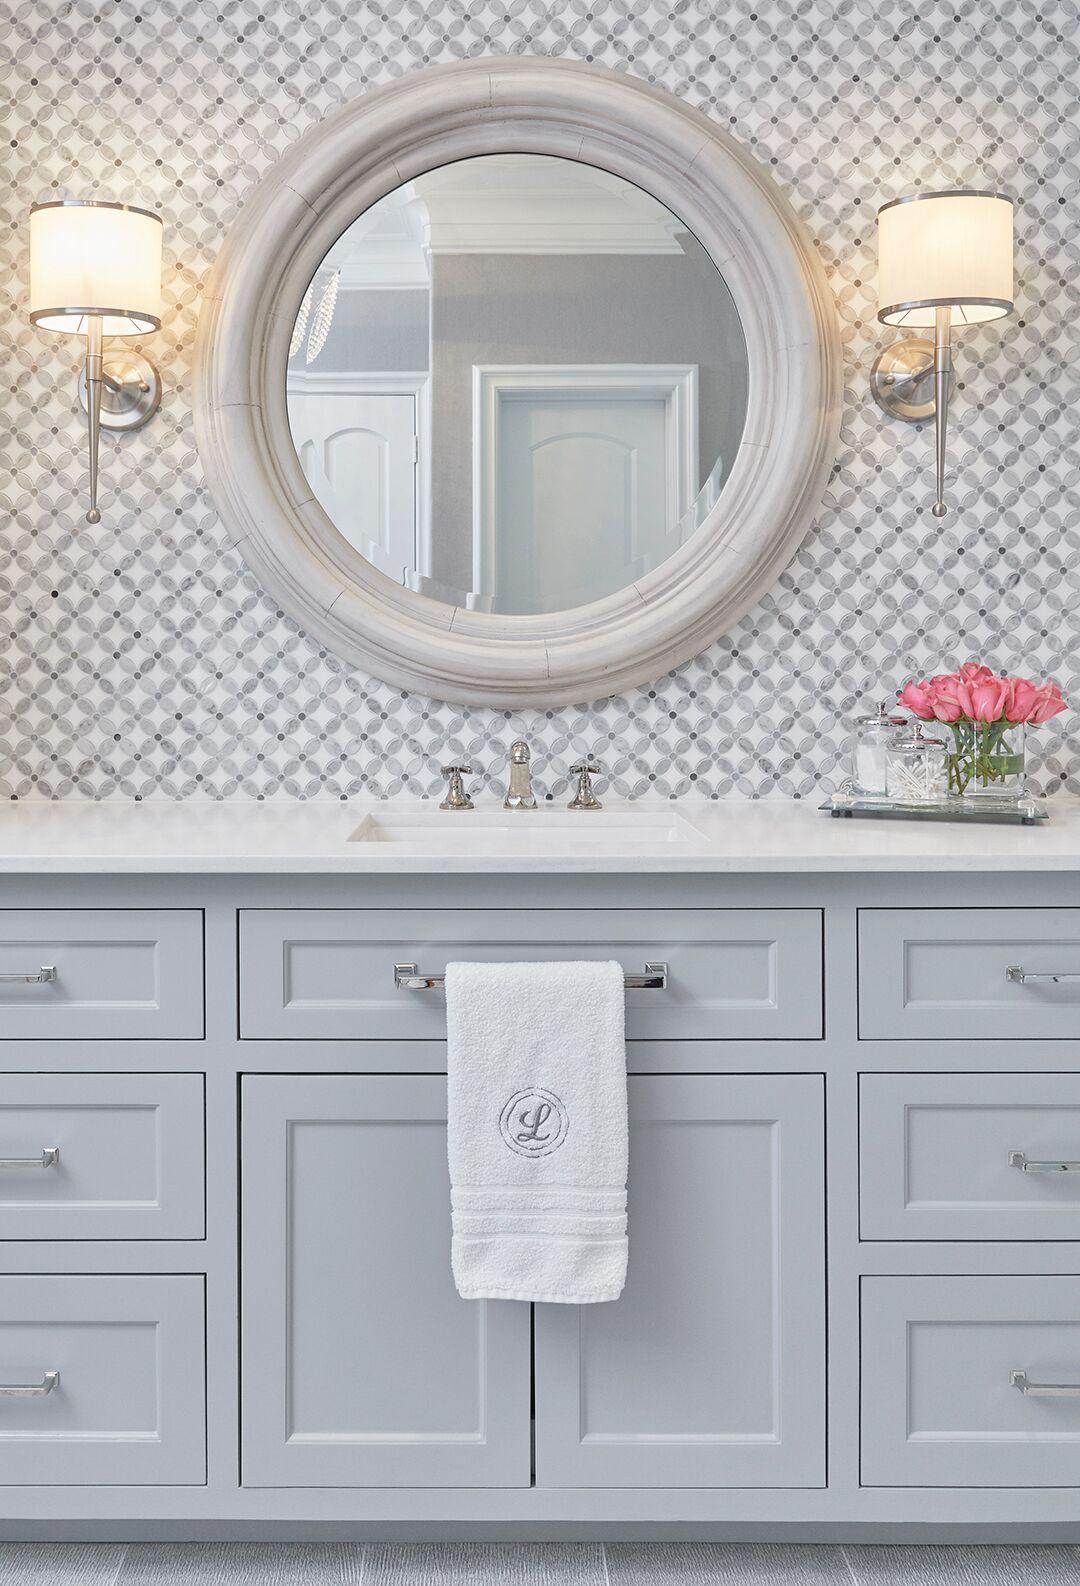 Master Bathroom Marble Mosaic Vanity Tile Backsplash With Gray Painted Vanity Lights And Round Mirror Bathr Painting Bathroom Bathroom Mirror Marble Bathroom